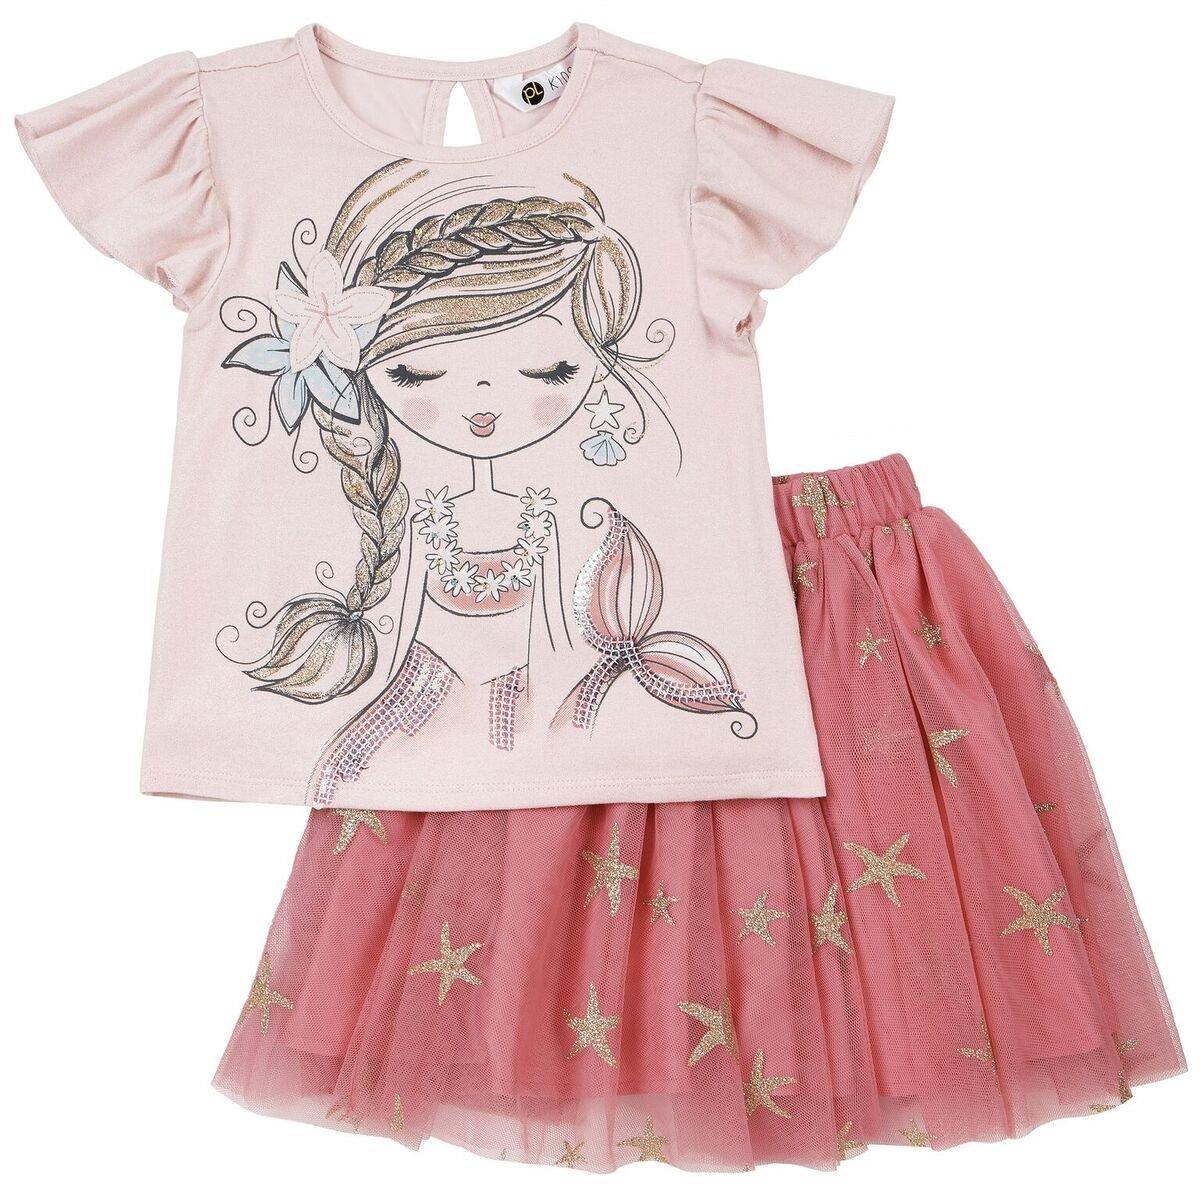 Petit Lem Little Sea Princess Girl 2pc Set Top and Skirt Knit